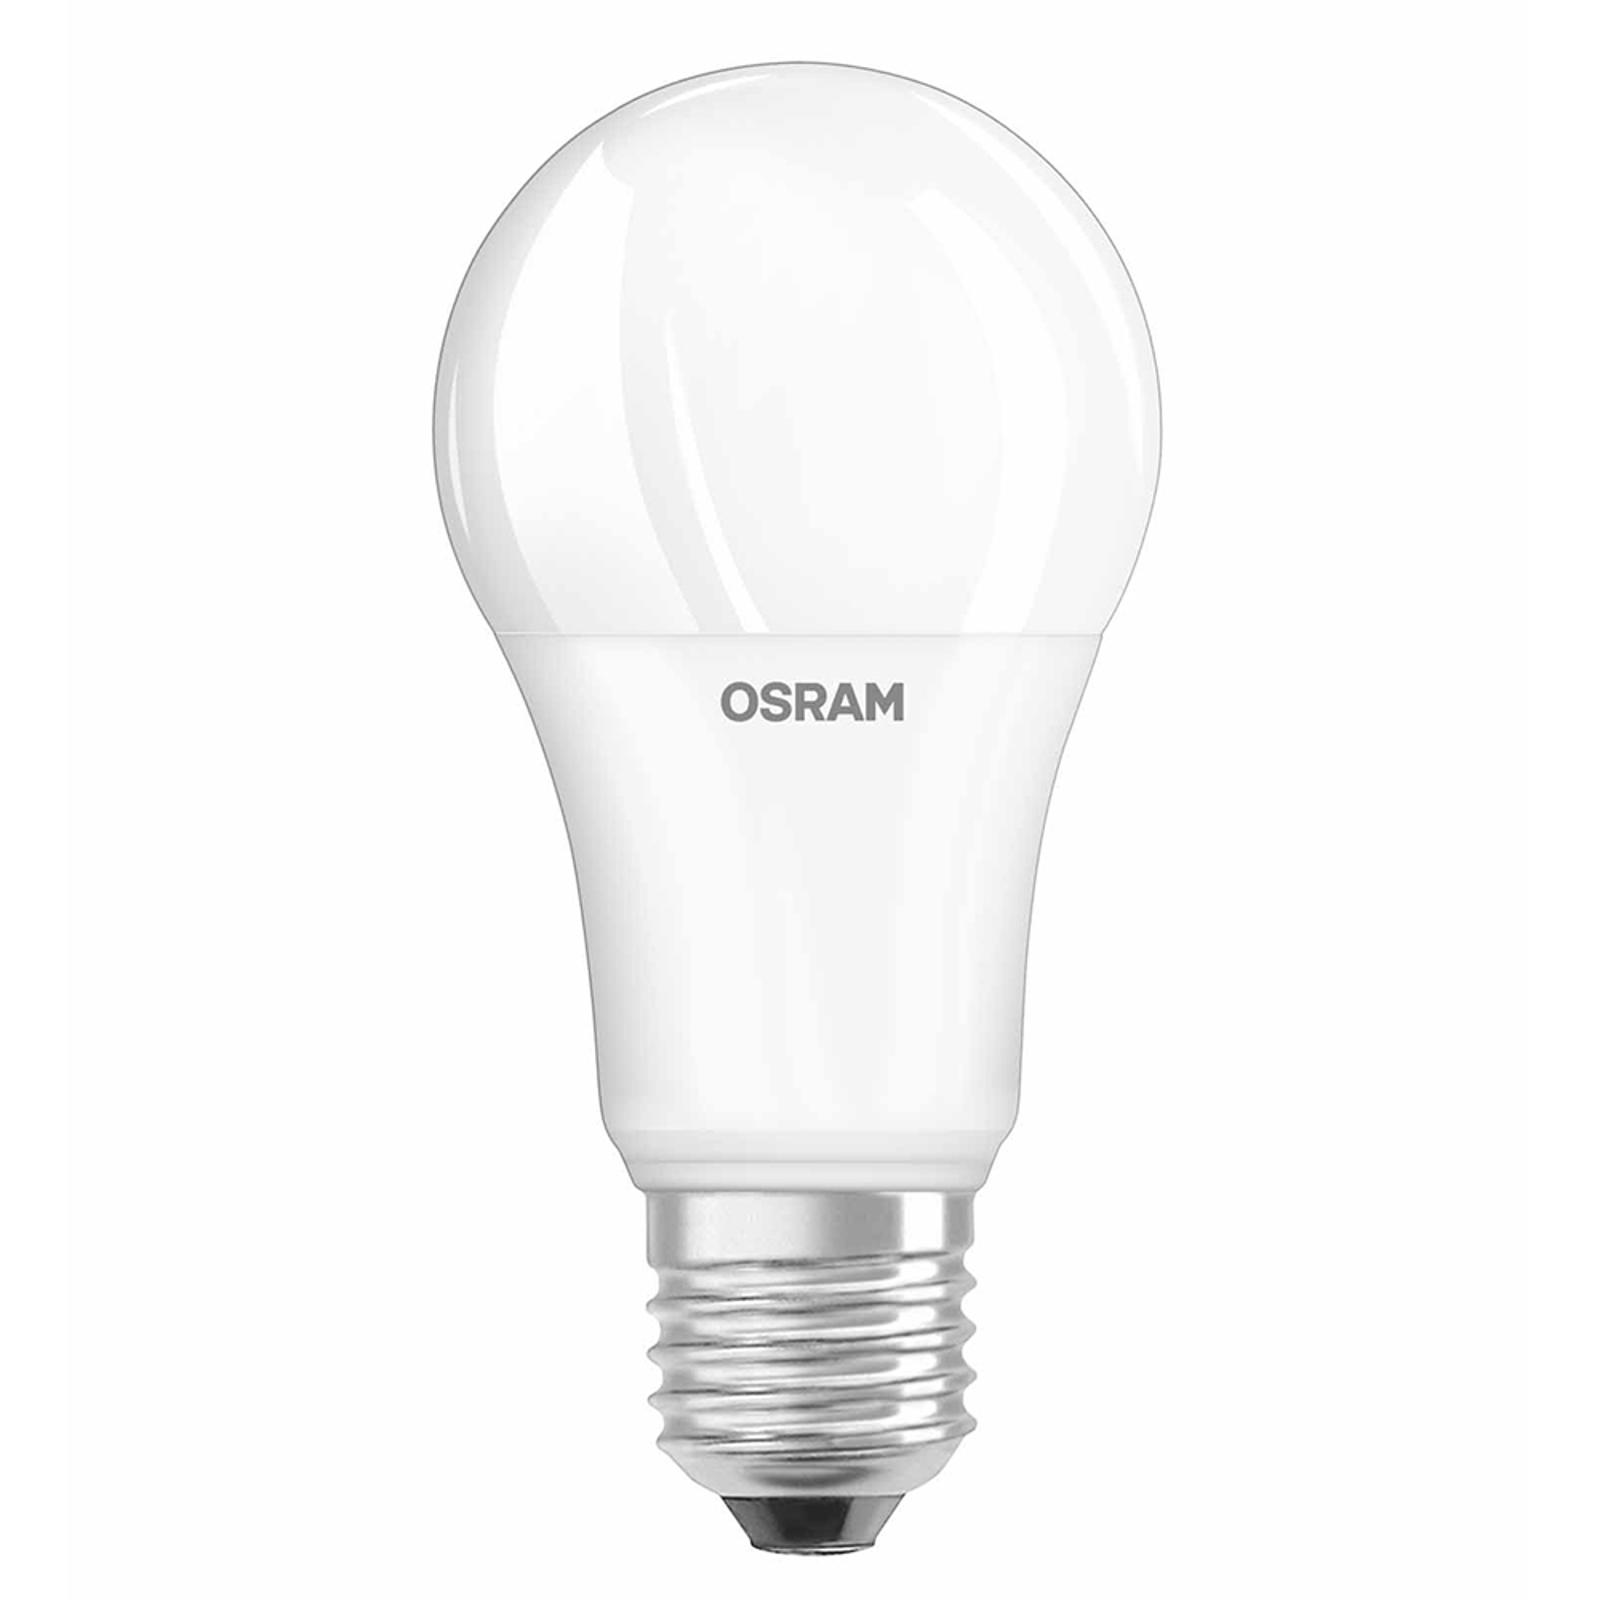 OSRAM-LED-lamppu E27 13W 827 Superstar, himmennys